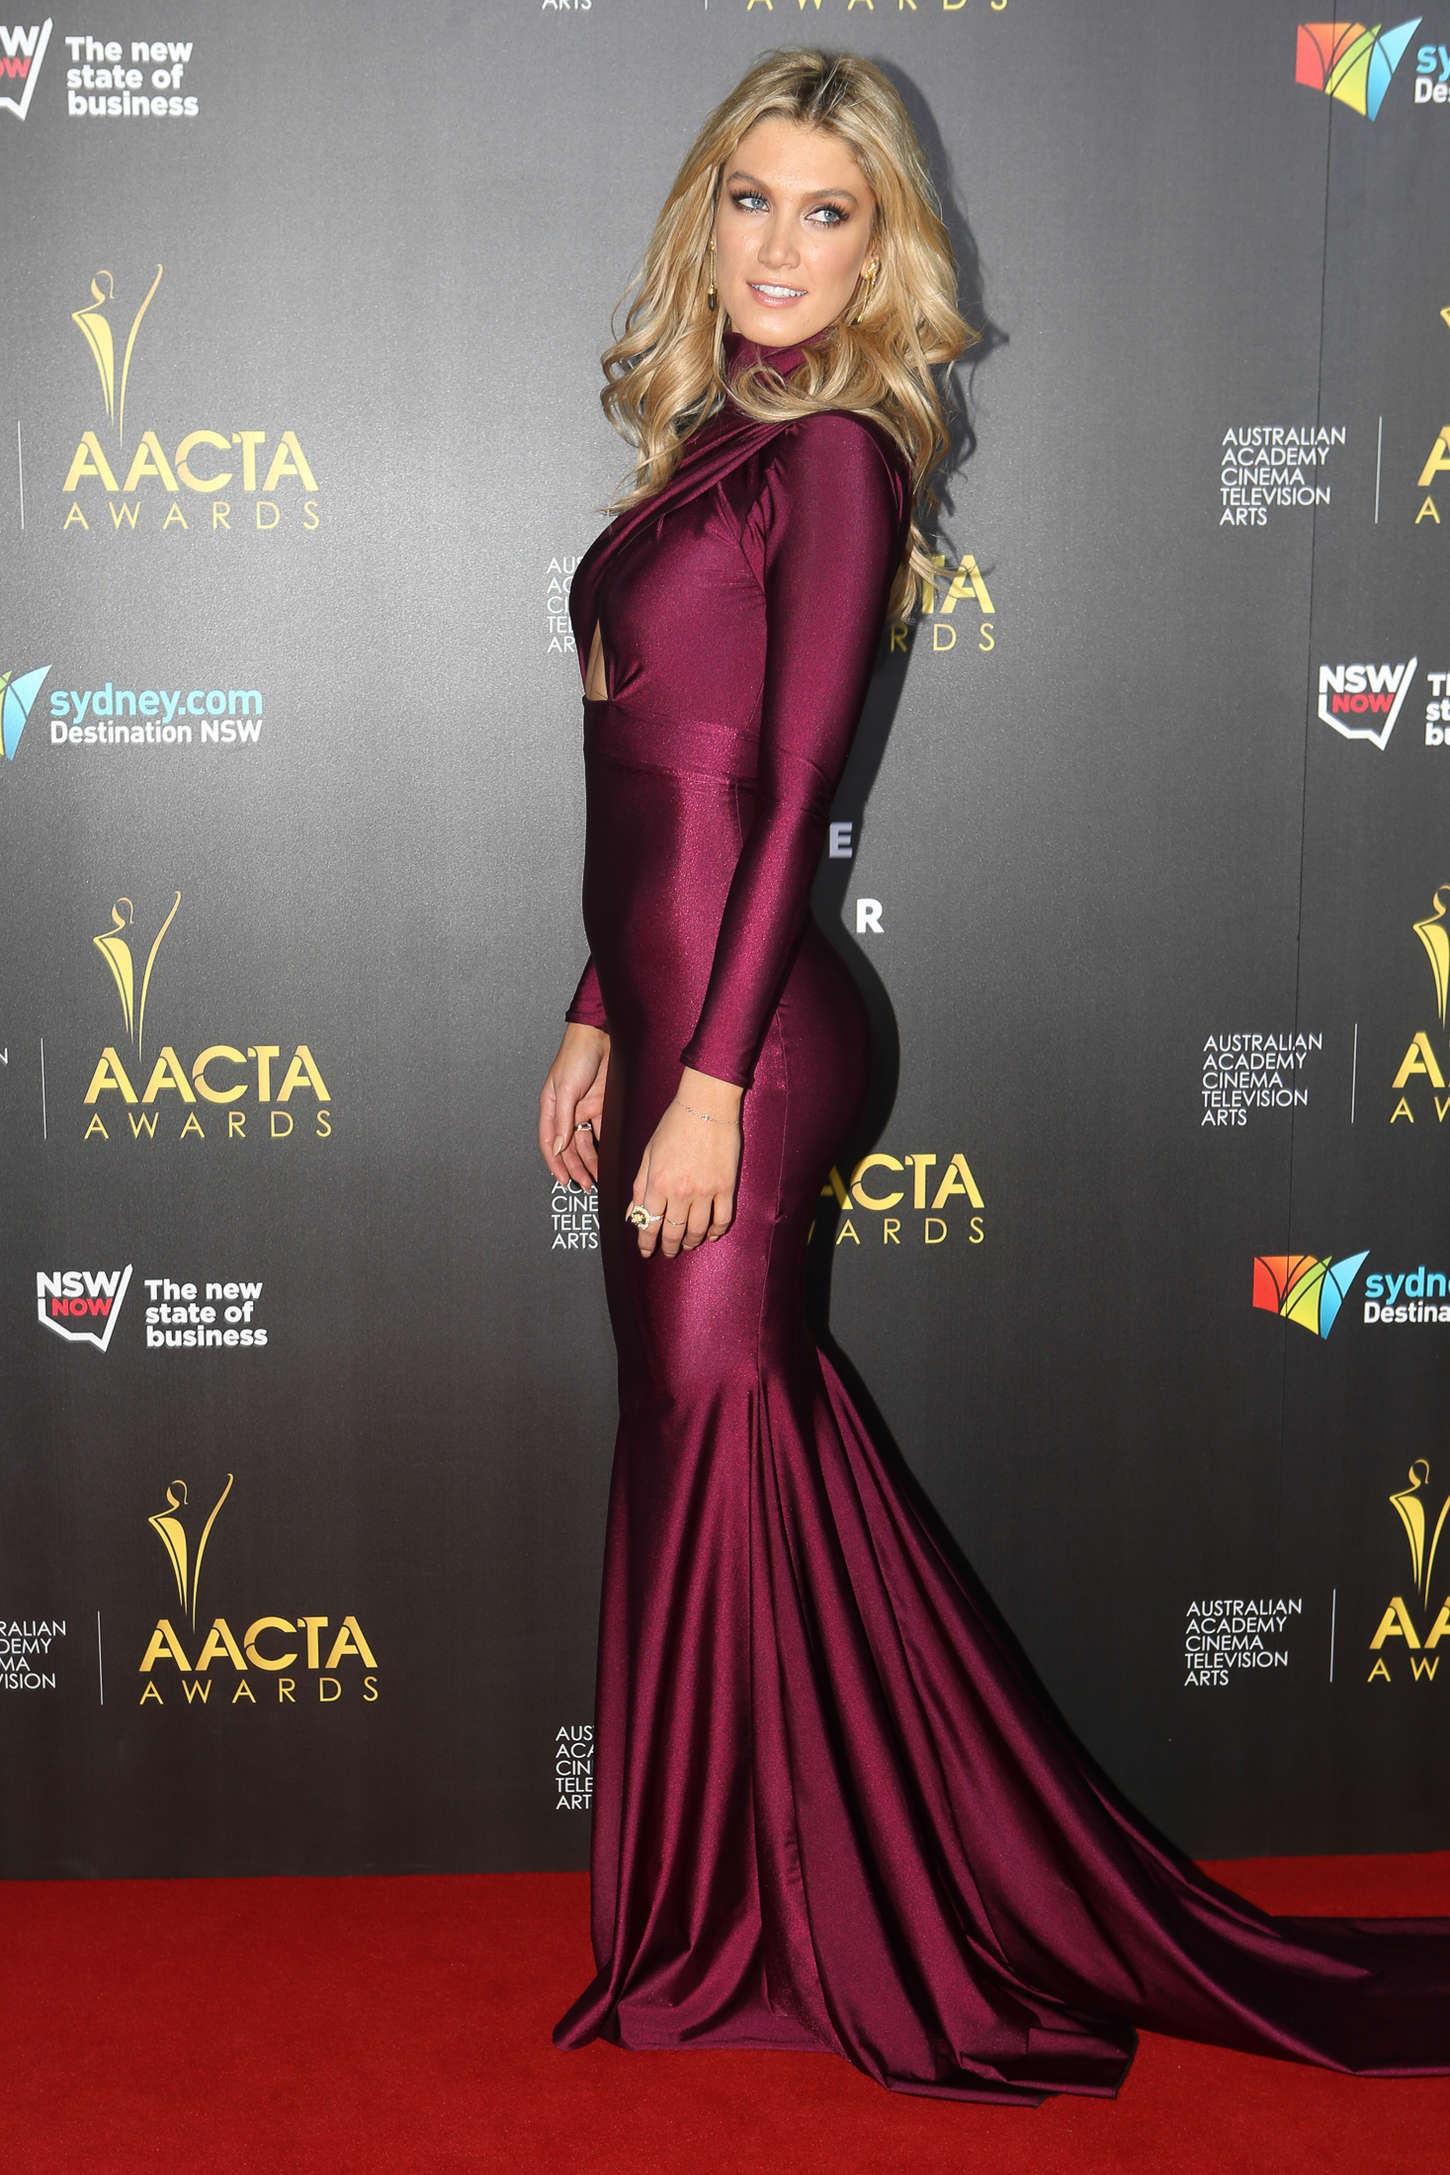 aacta awards - photo #32